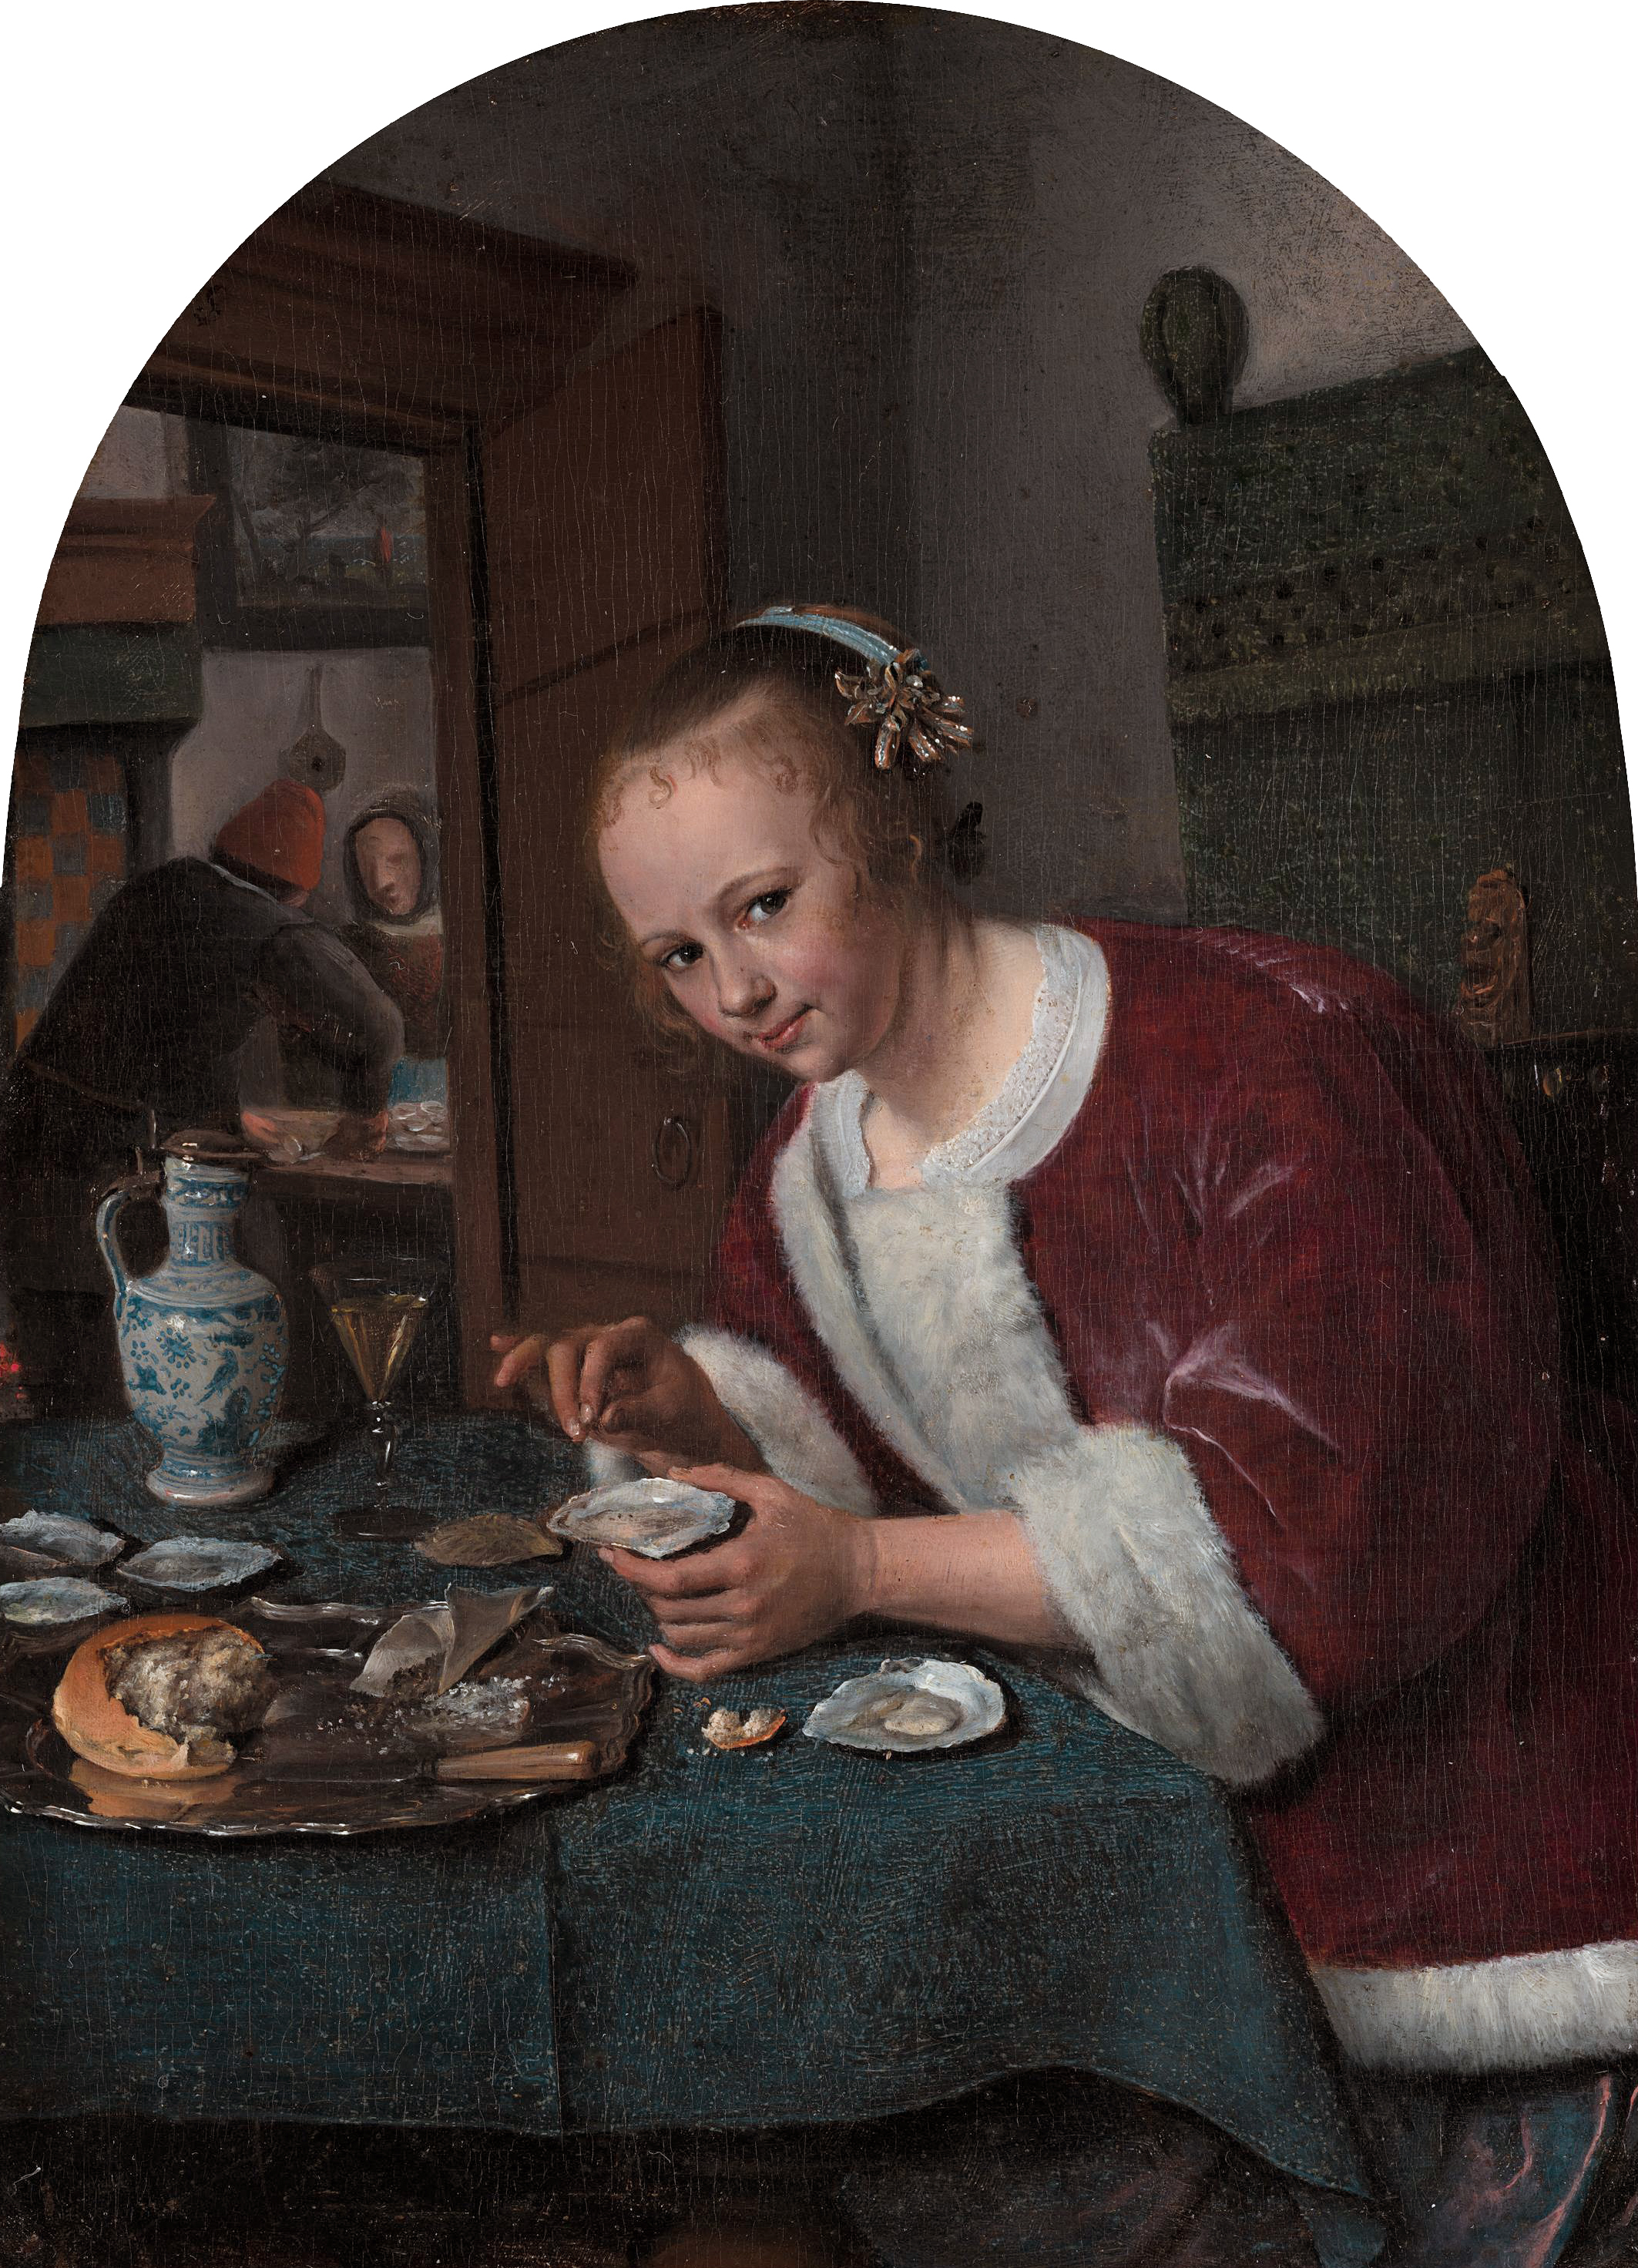 Eating live seafood - Wikipedia